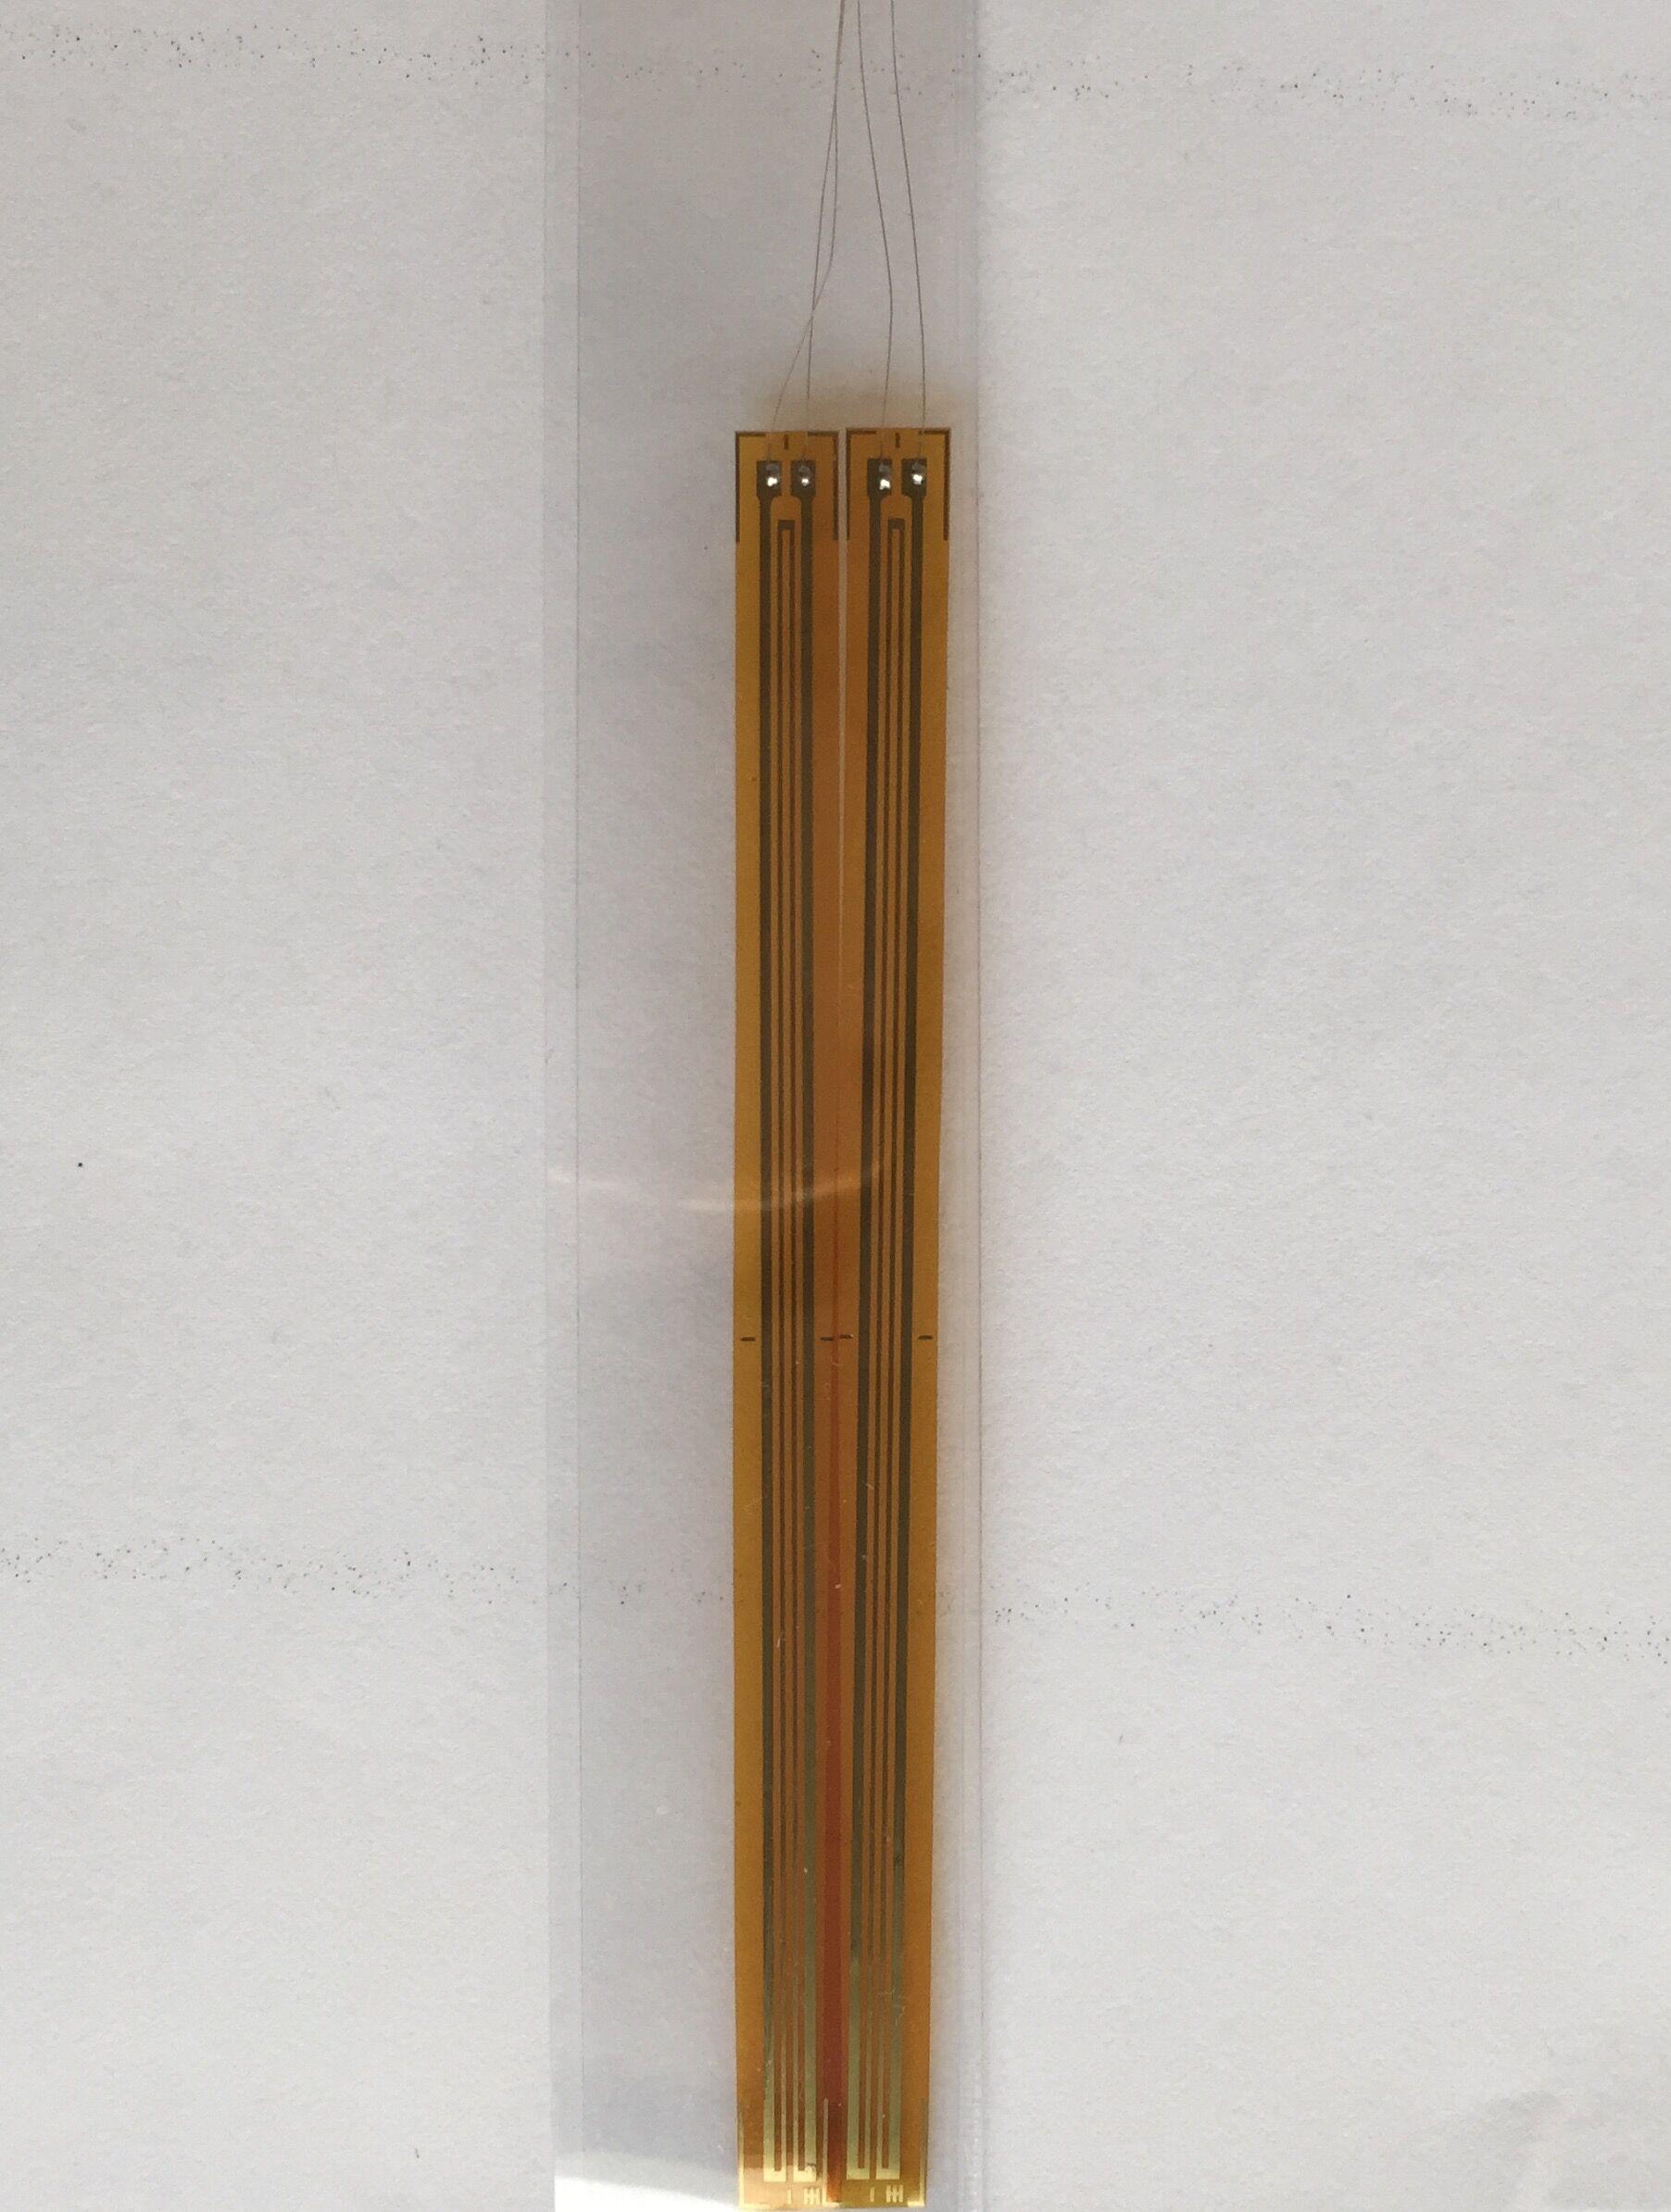 Foil type resistance strain gauge / strain gauge / concrete strain gauge BX120-80AA foil type resistance strain gauge strain gauge concrete strain gauge bx120 80aa